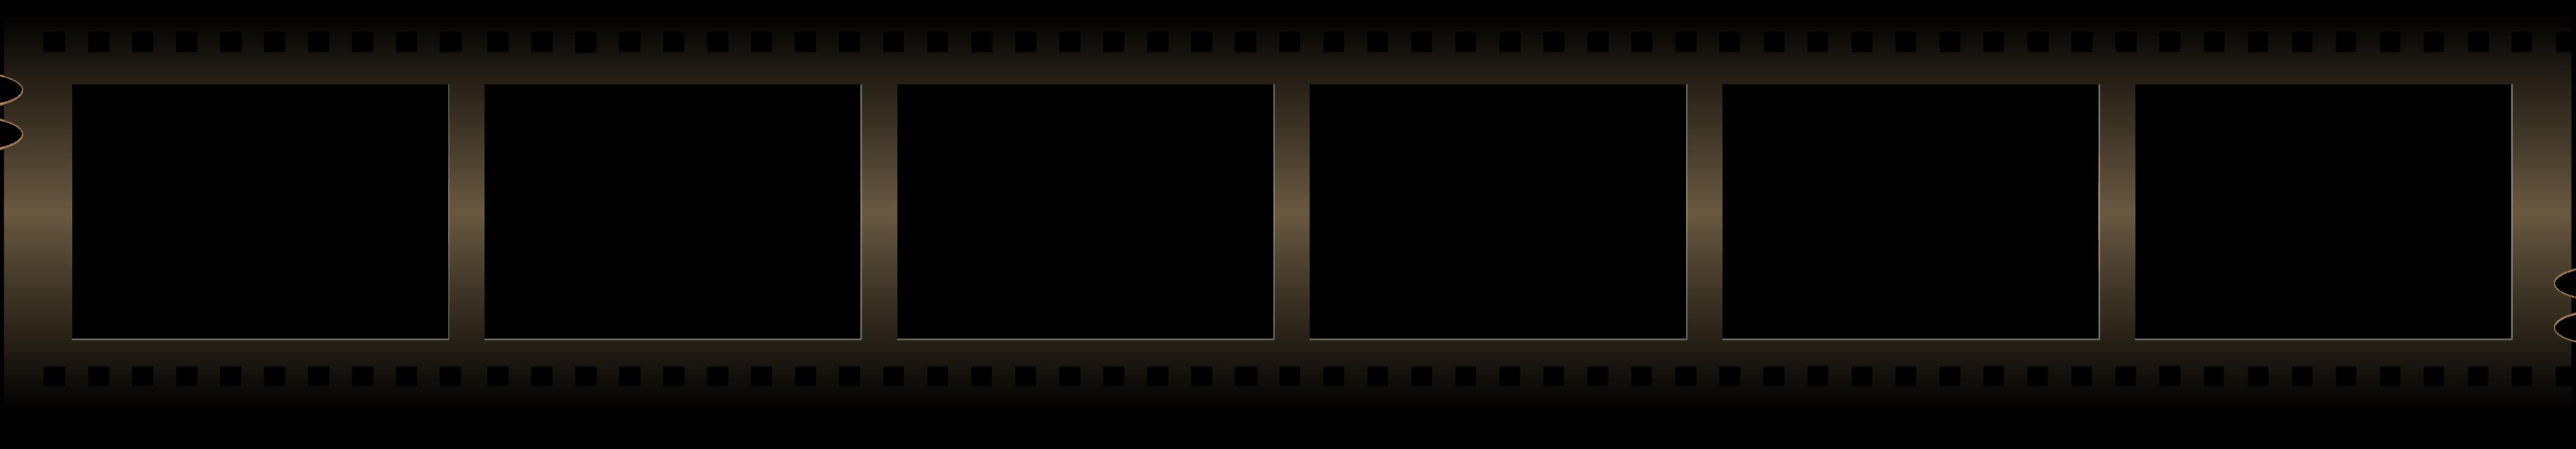 Film Strip Png - ClipArt Best